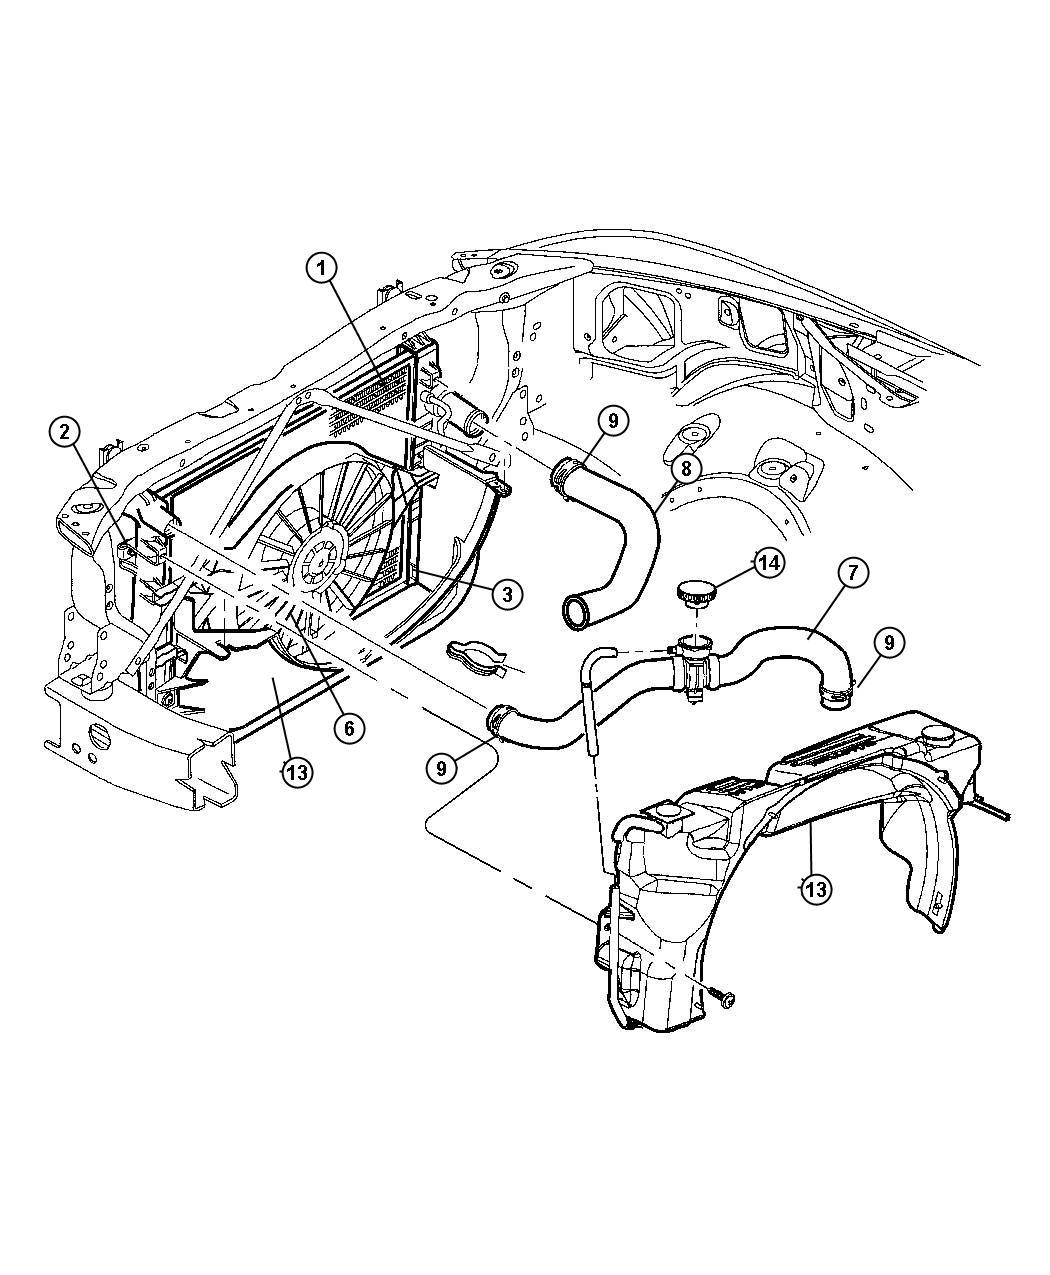 durango 02 sensor wiring diagram